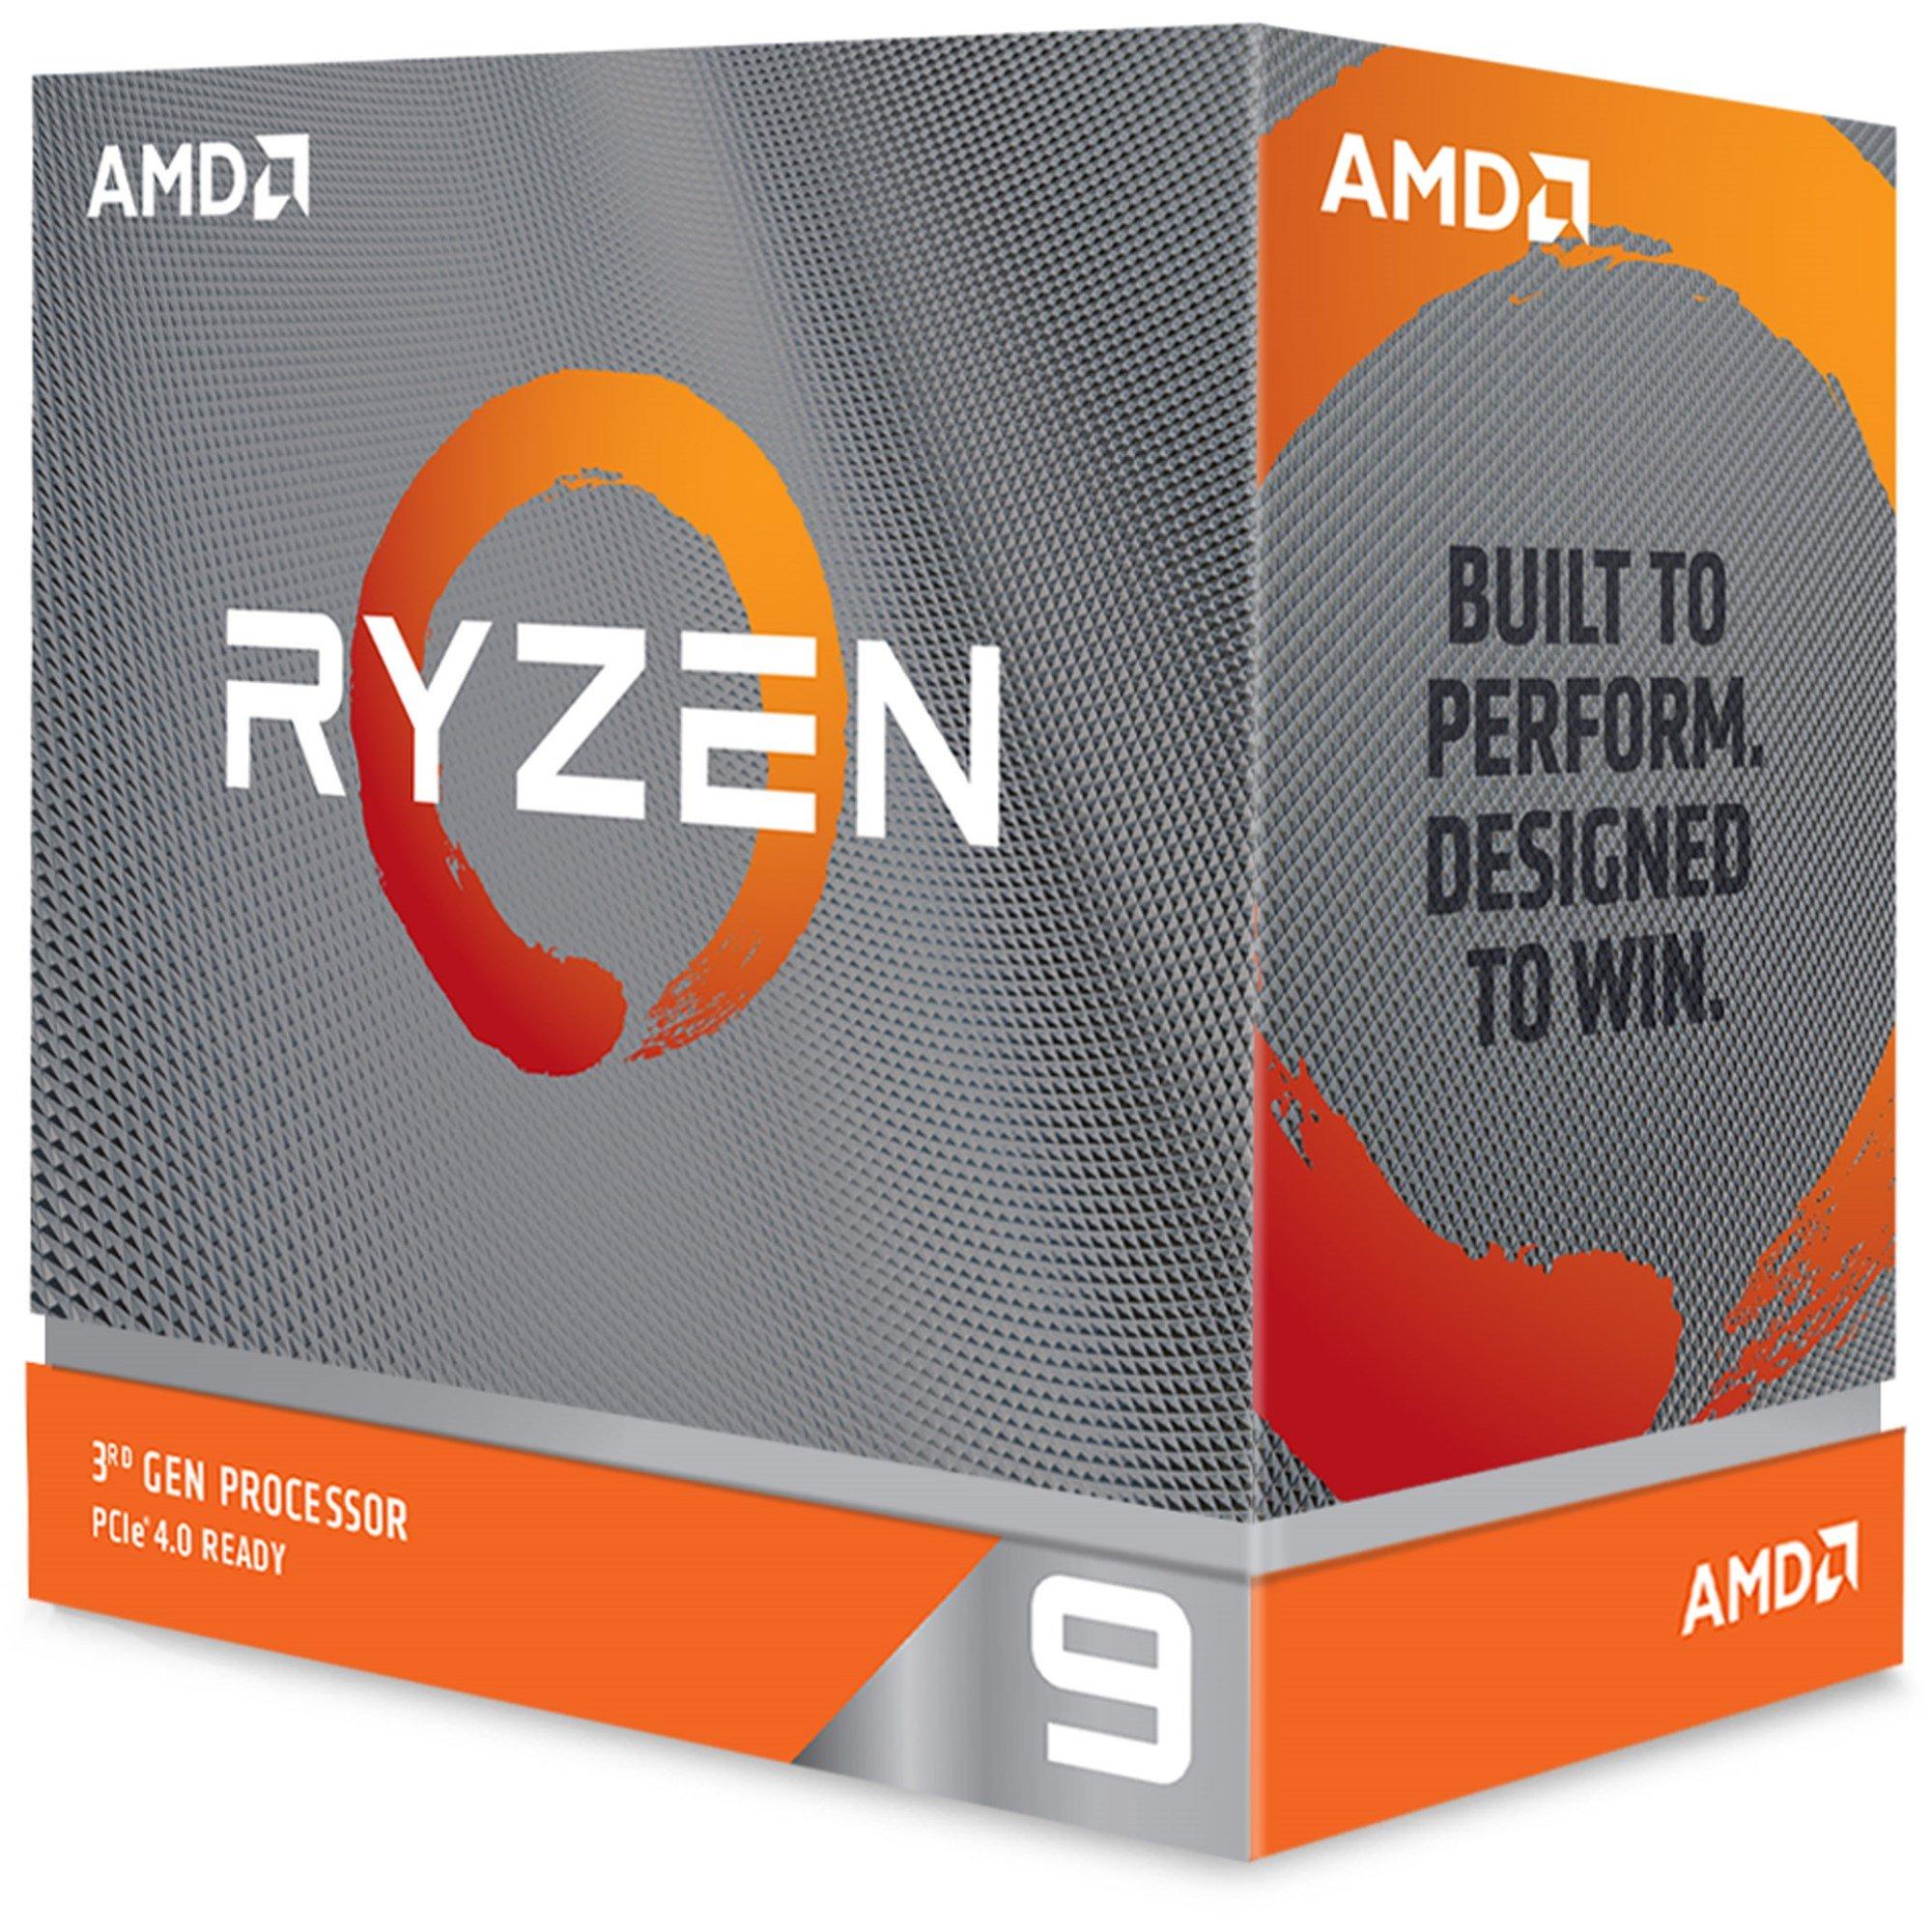 AMD Ryzen 9 3950X Processor (16C/32T, 72MB Cache, 4.7 GHz Max Boost) + 3 month gamespass £698.87 @ CCLOnline